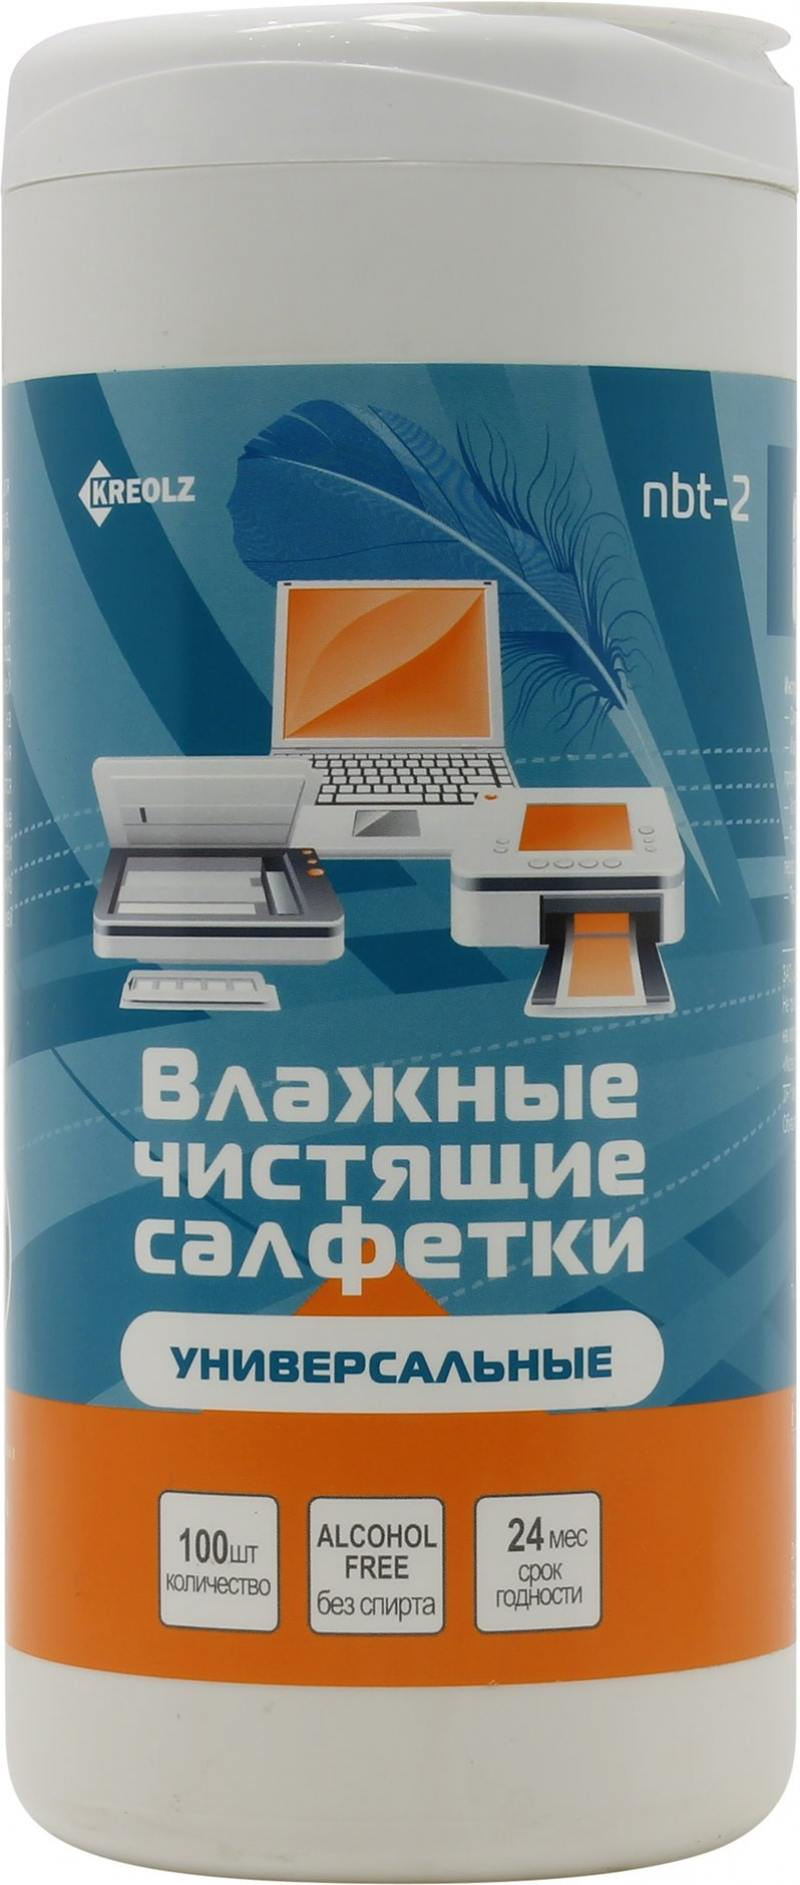 Чистящие салфетки Kreolz NBT-2 100 шт hgh20ca 100